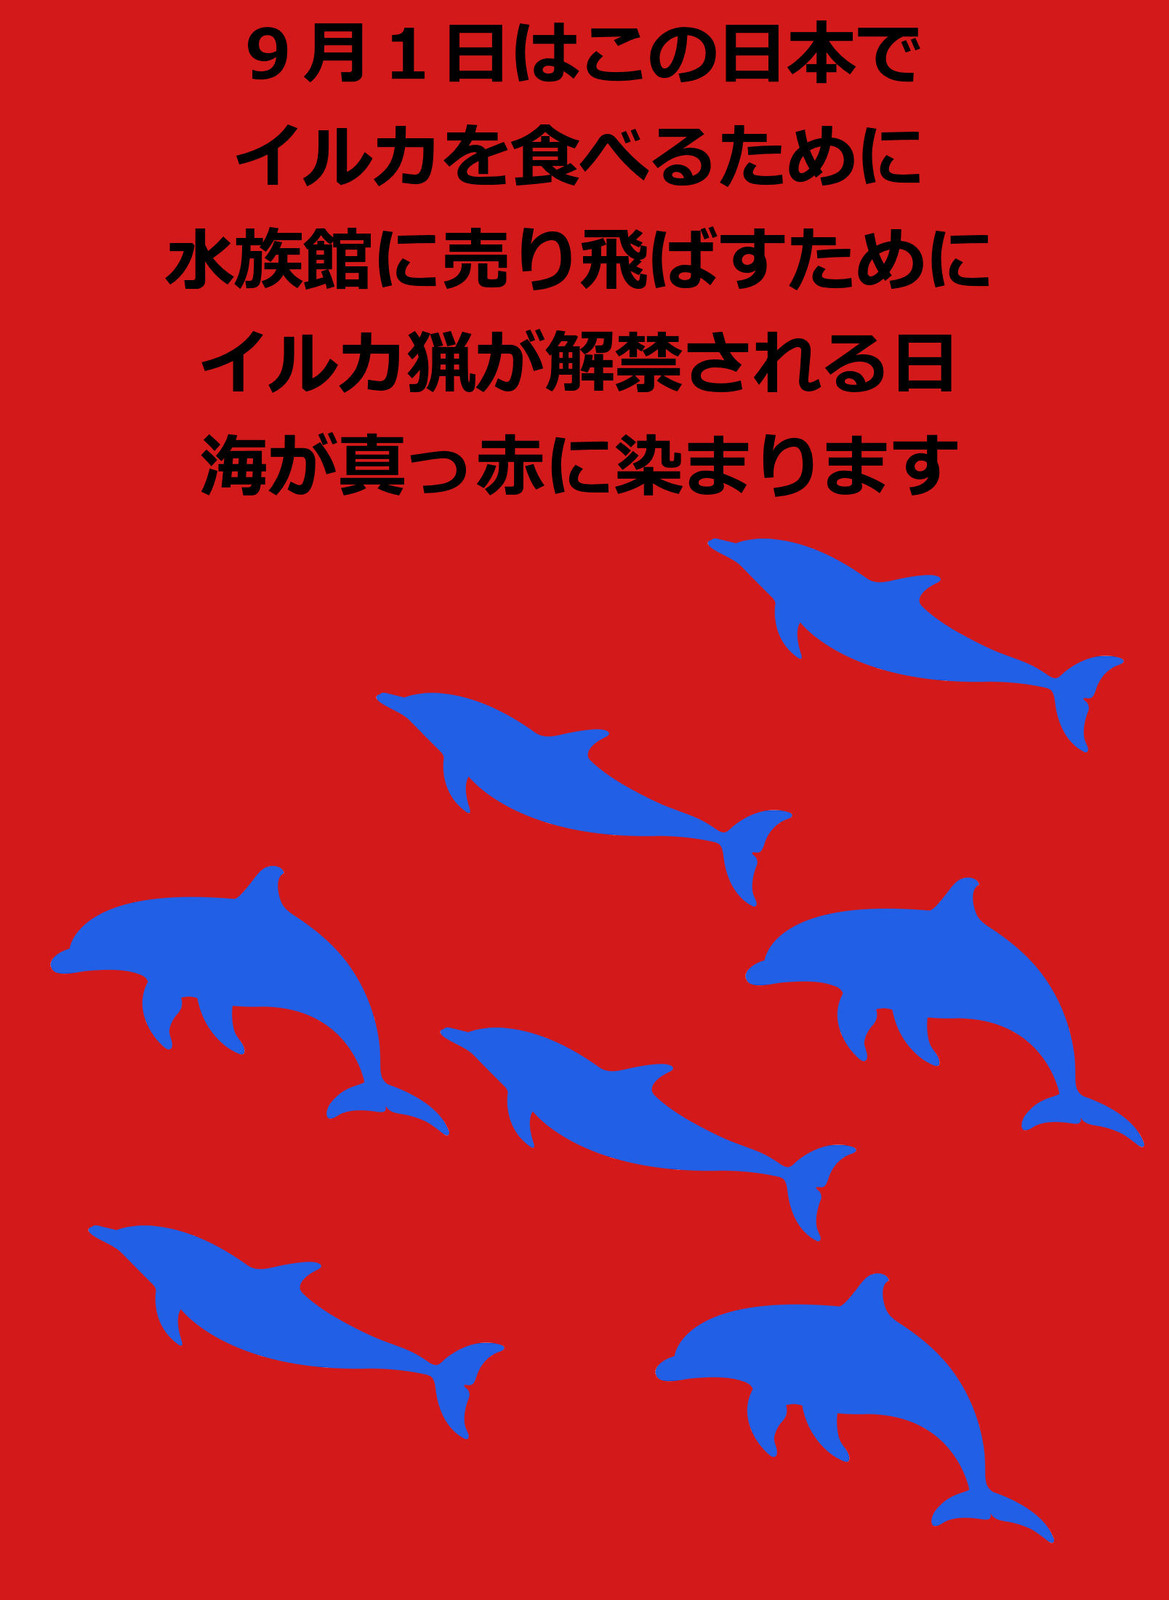 Japandolphinsday2